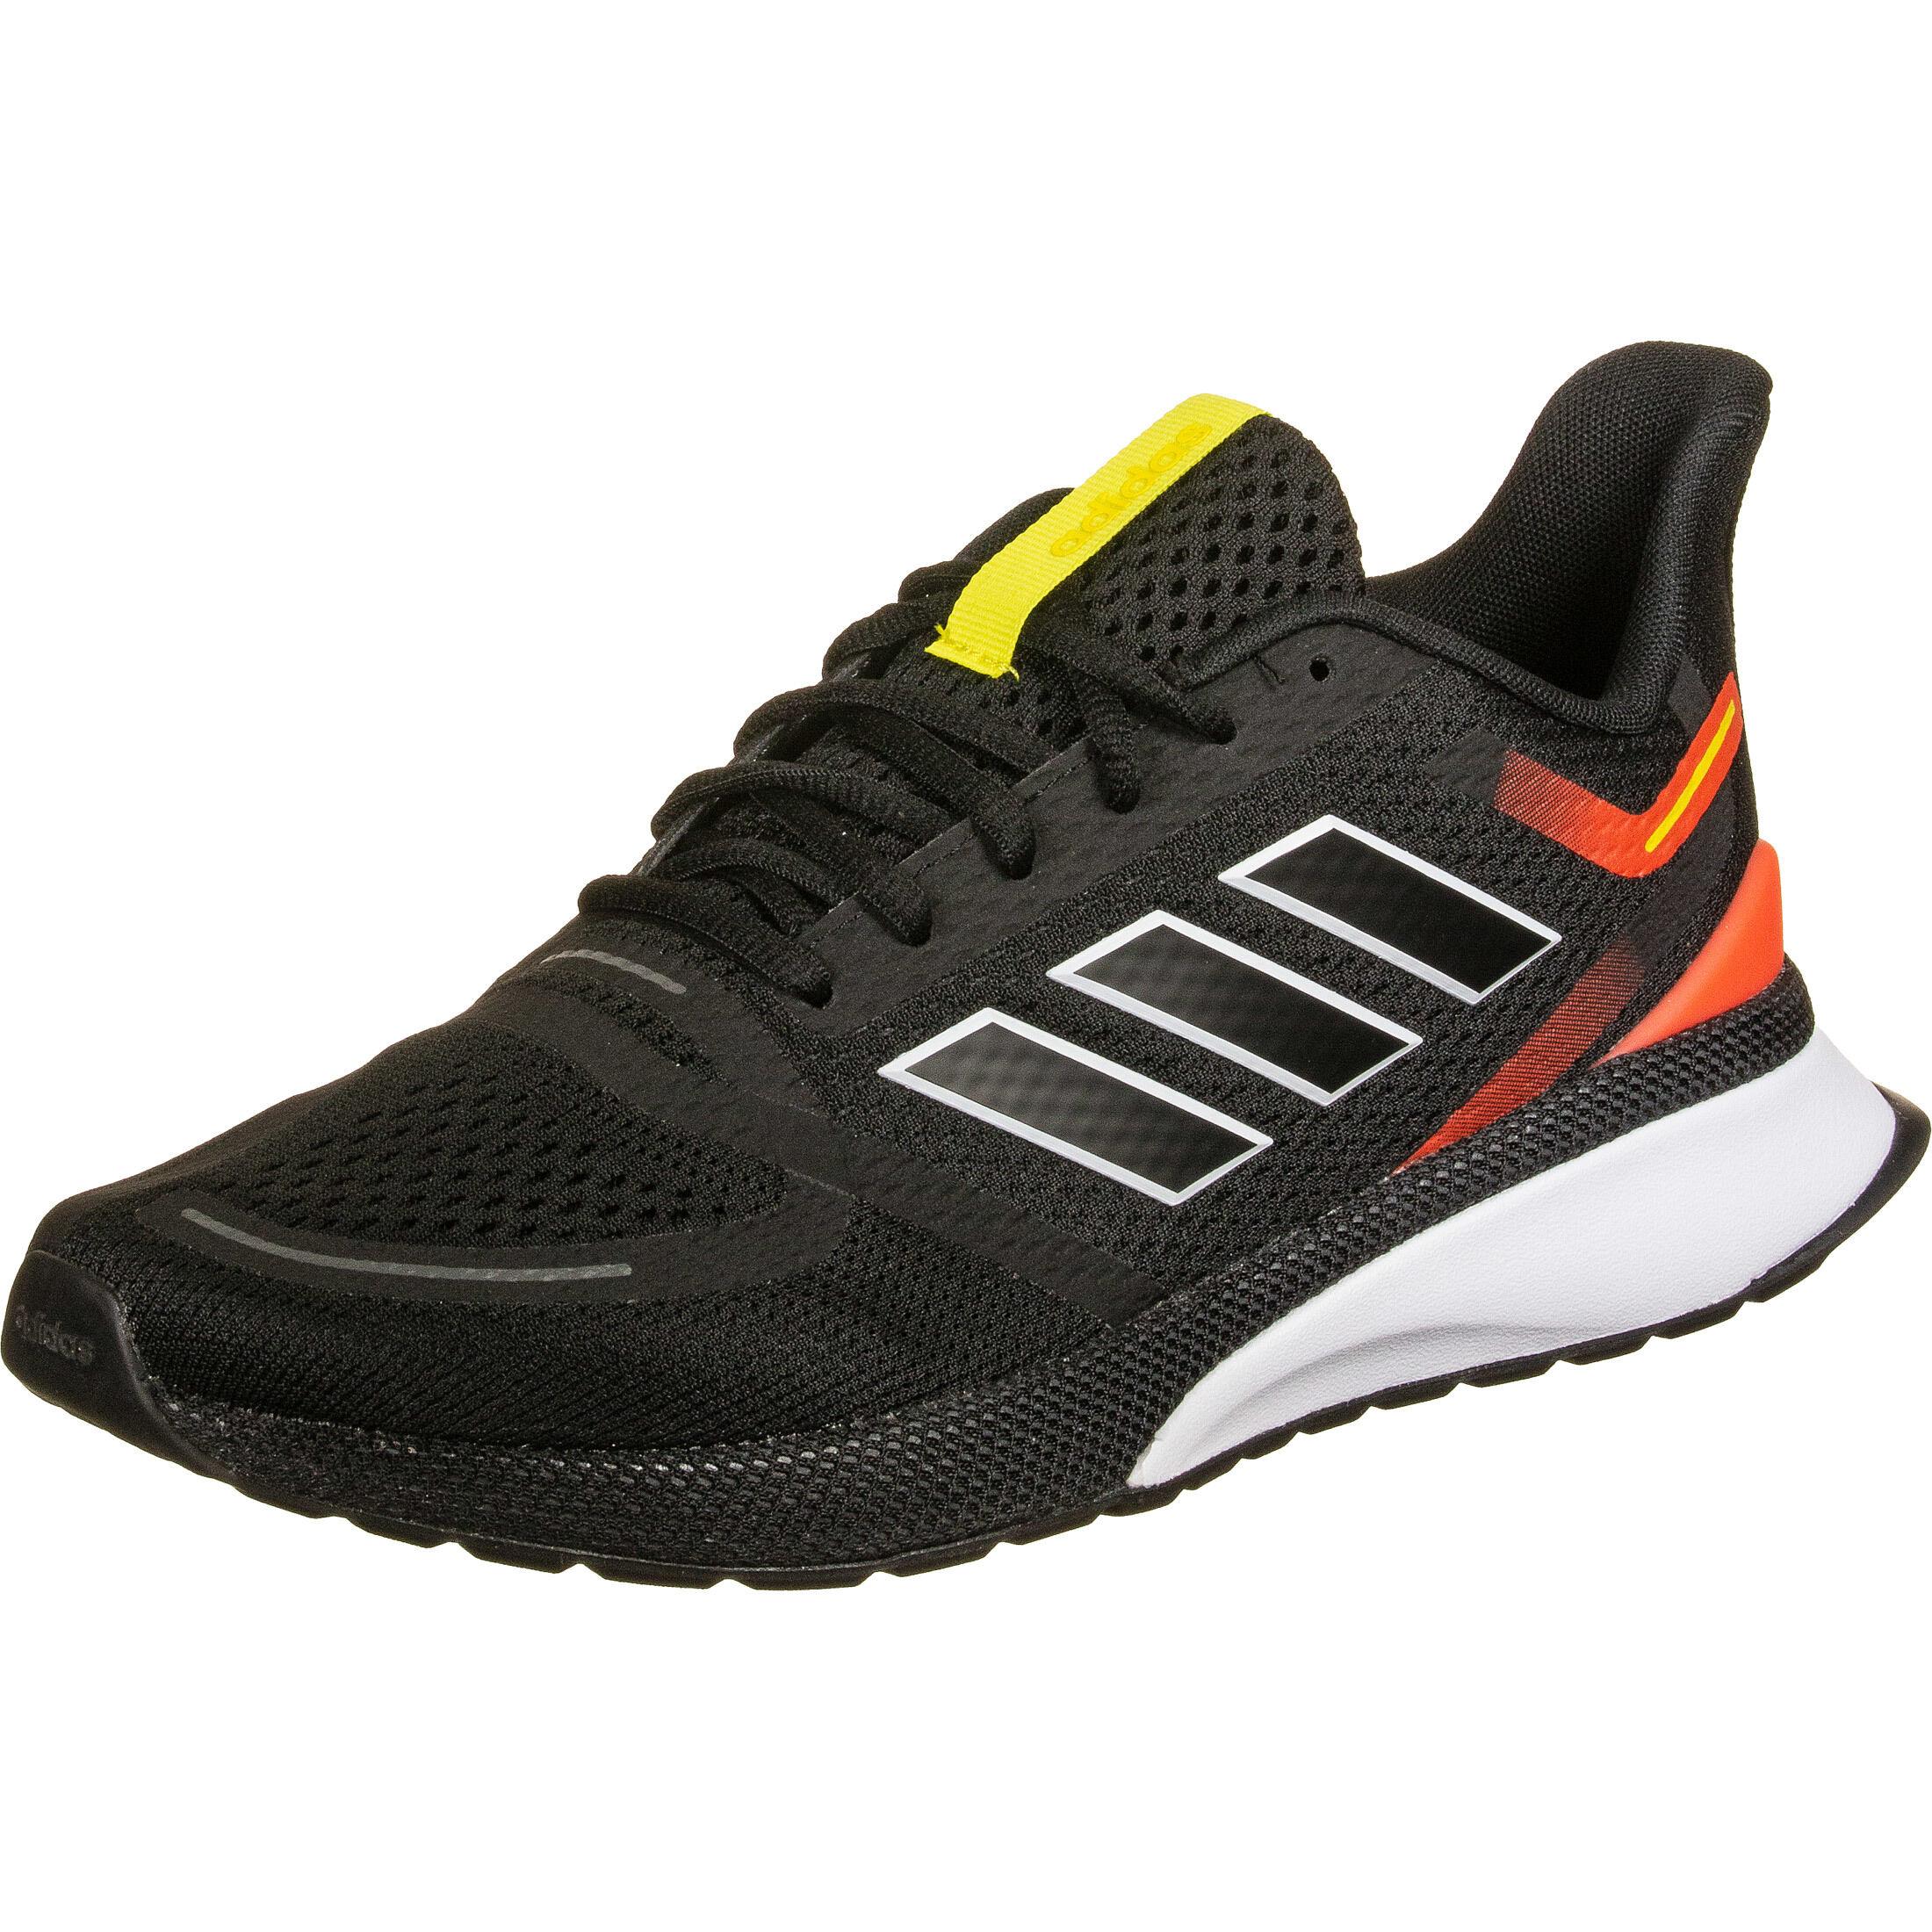 Adidas Novafvse Sneaker Herren schwarz rot im Online Shop